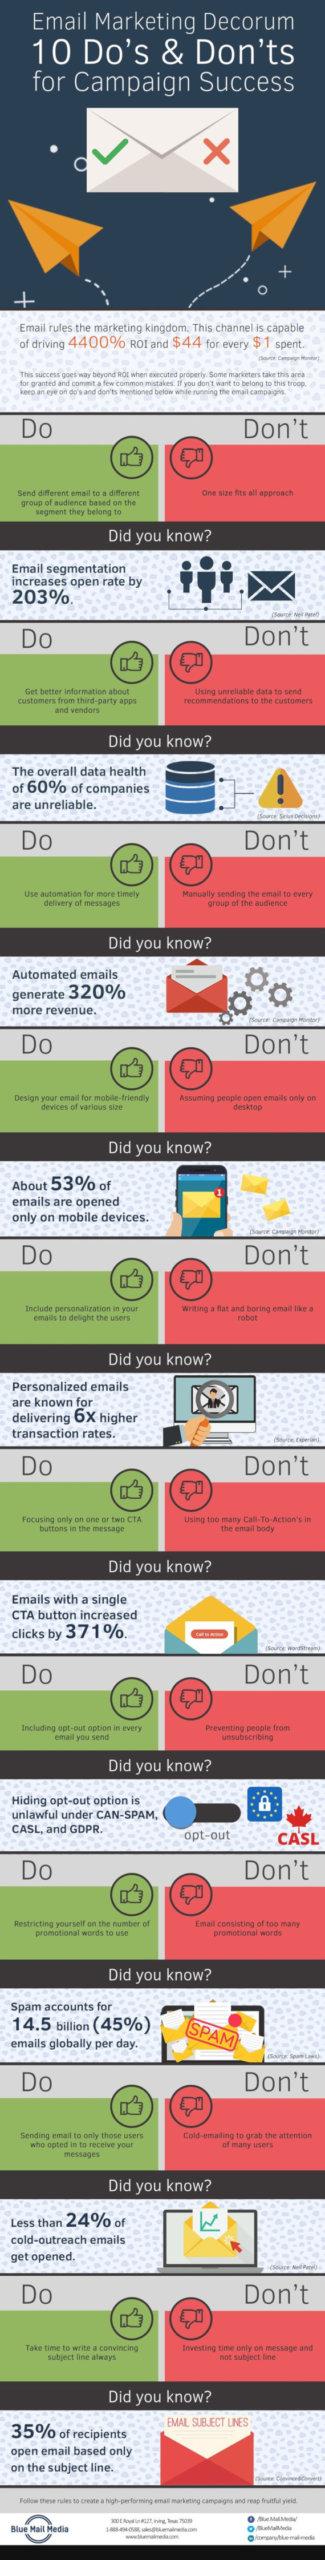 10 Do's und Don'ts zum richtigen E-Mail-Marketing